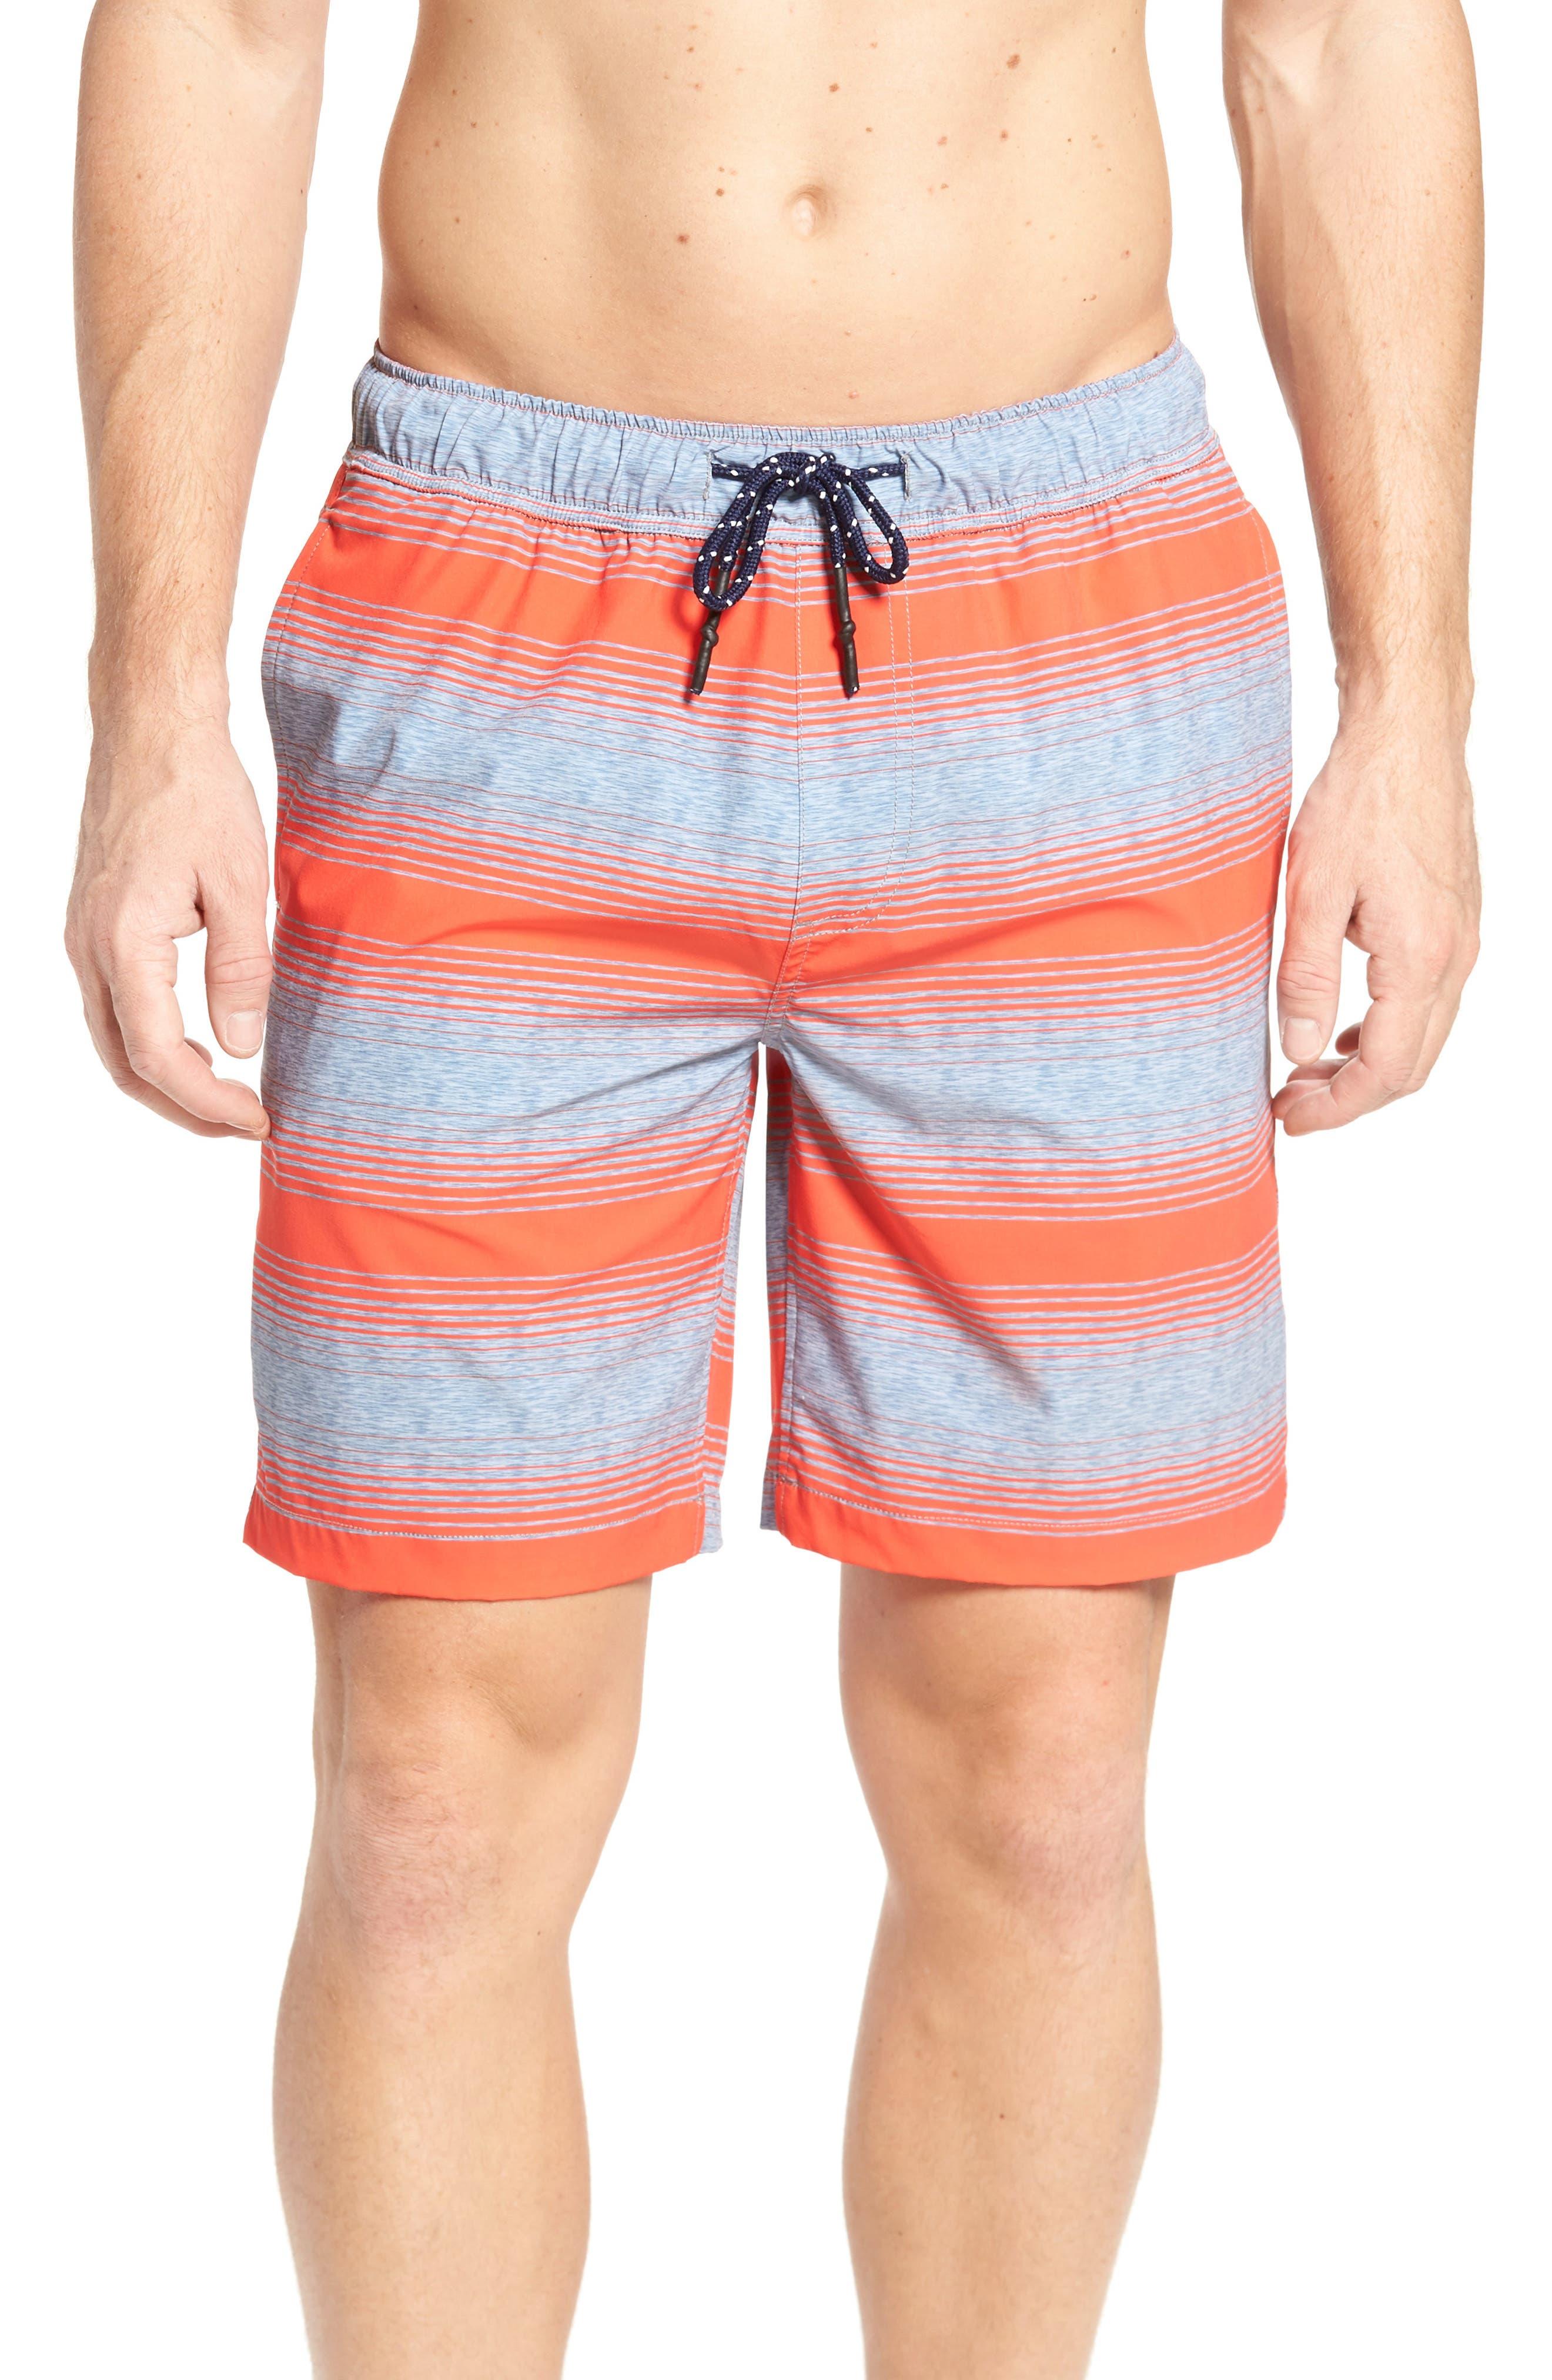 Stripe Swim Trunks,                         Main,                         color, 850